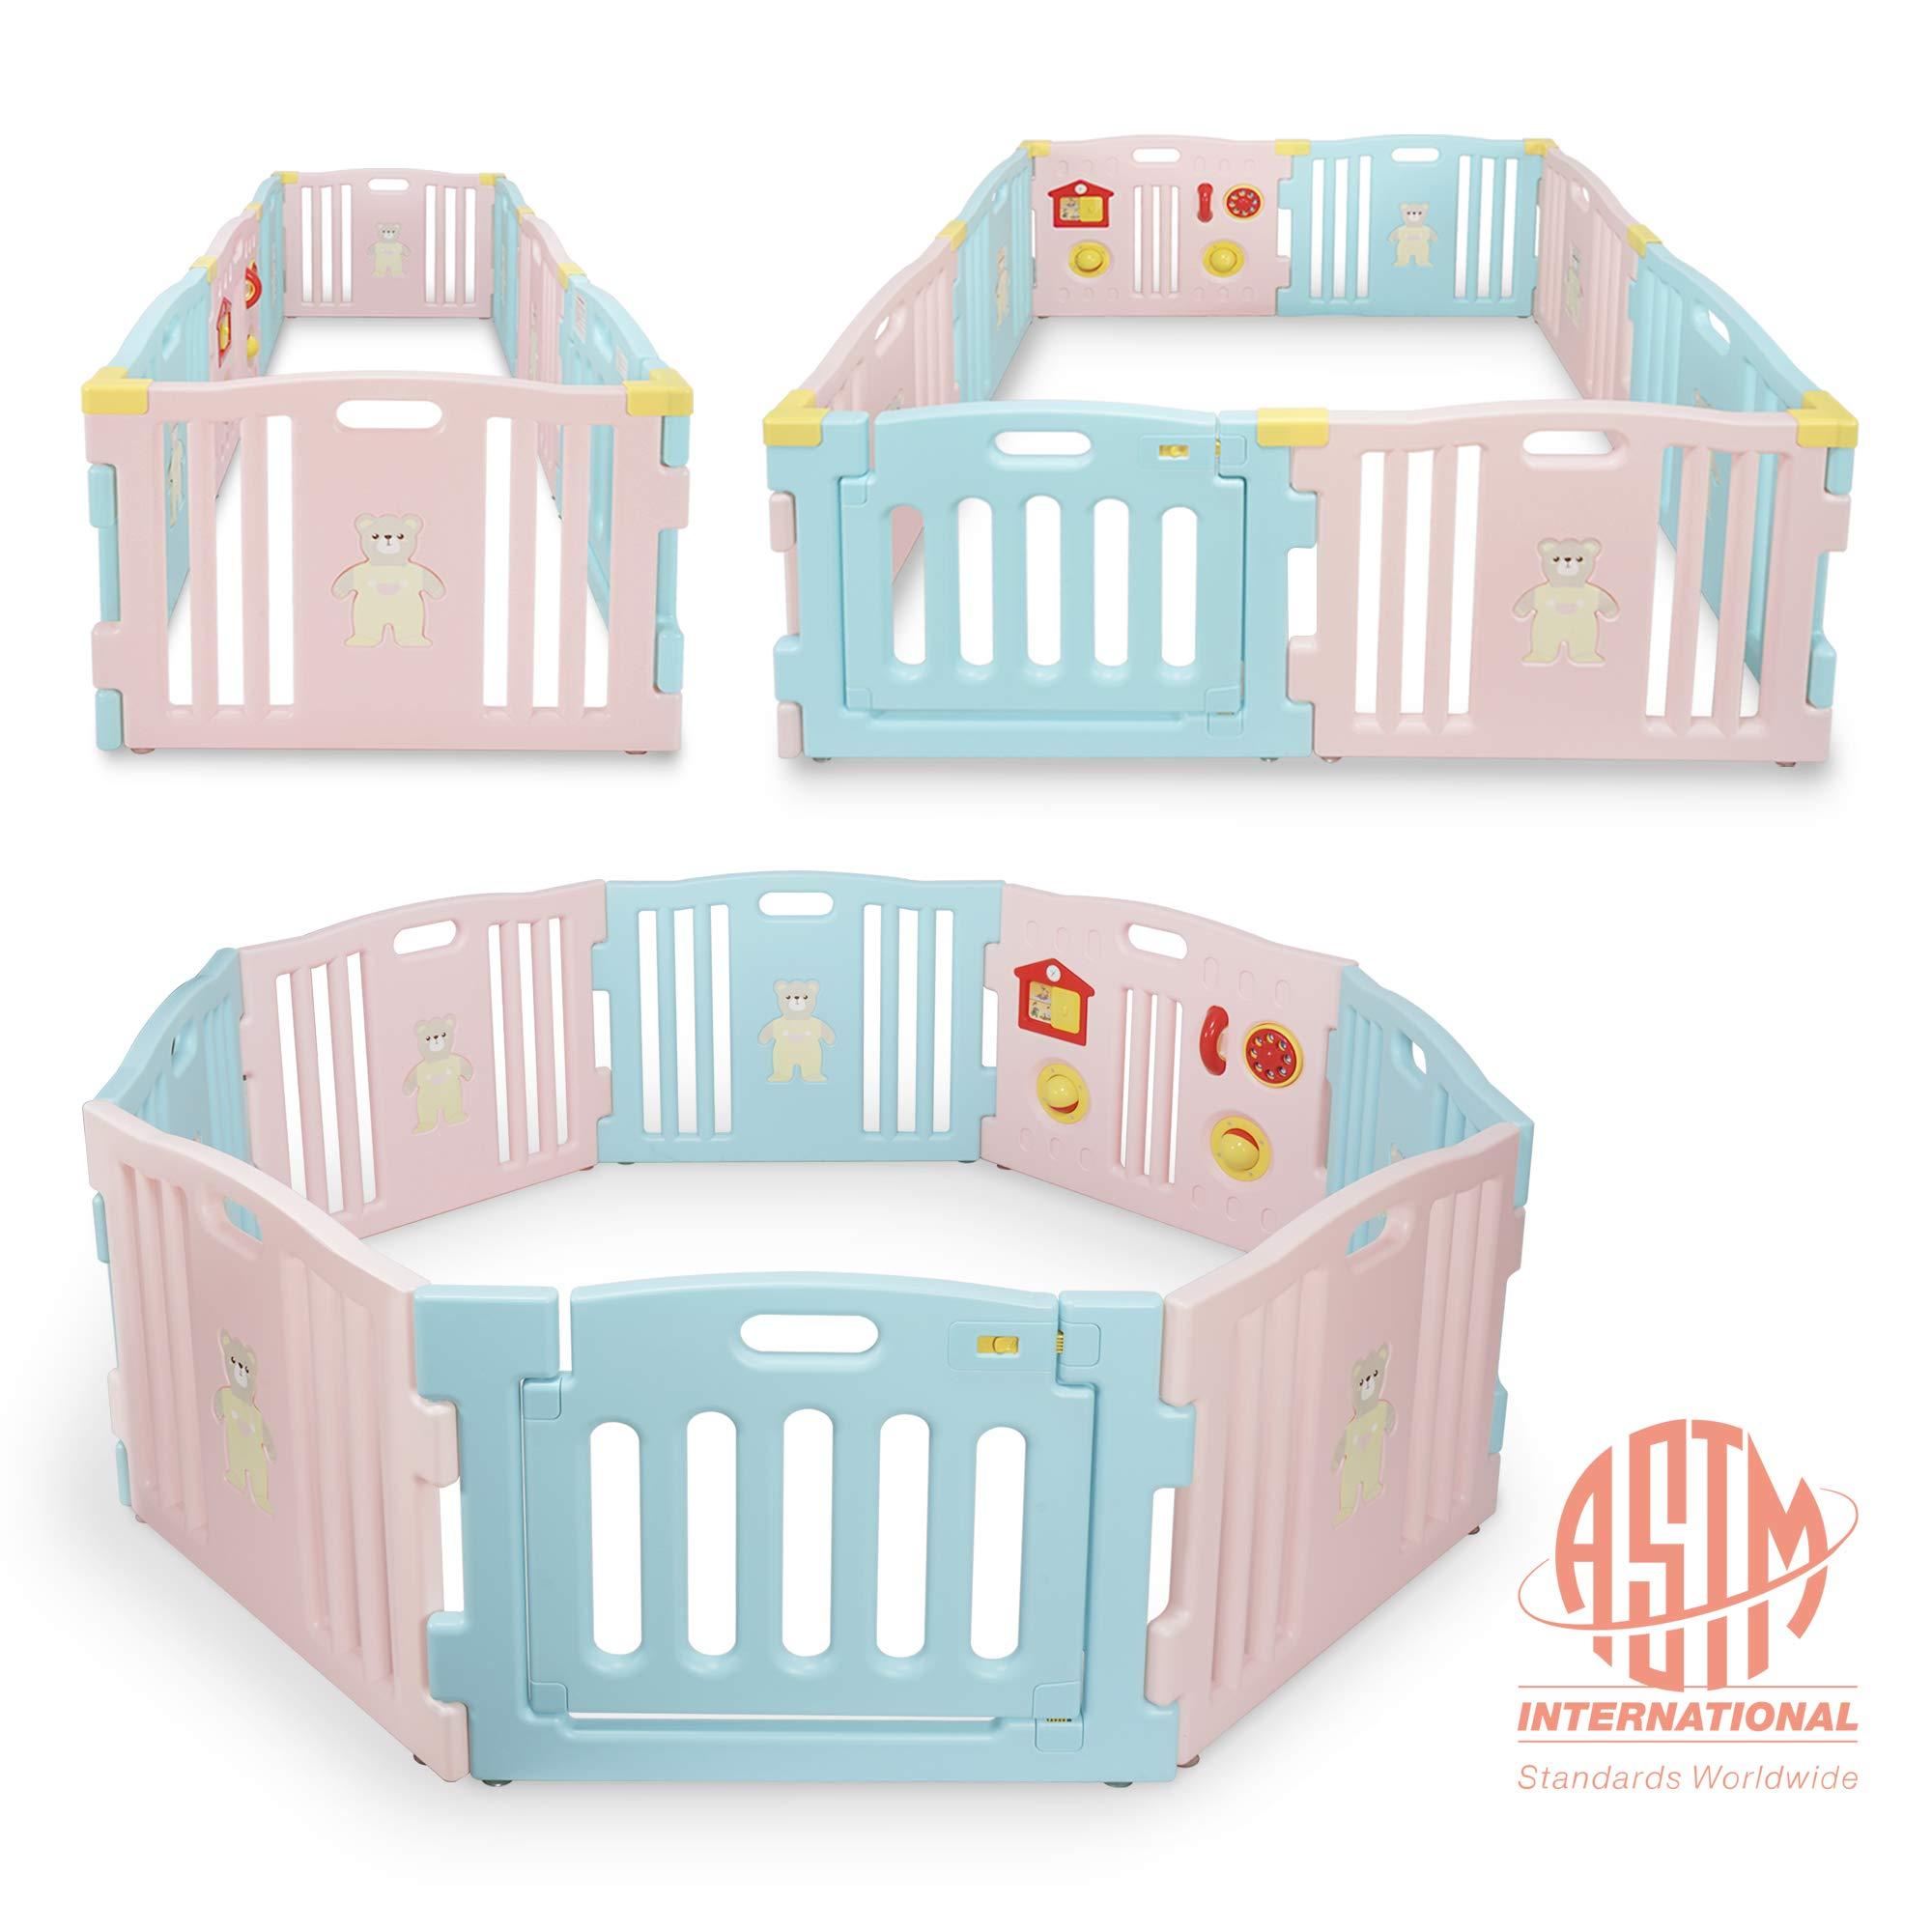 Kidzone Baby Interactive Playpen 8 Panel Safety Gate Children Play Center Child Activity Pen ASTM Certified (Pink- Blue)